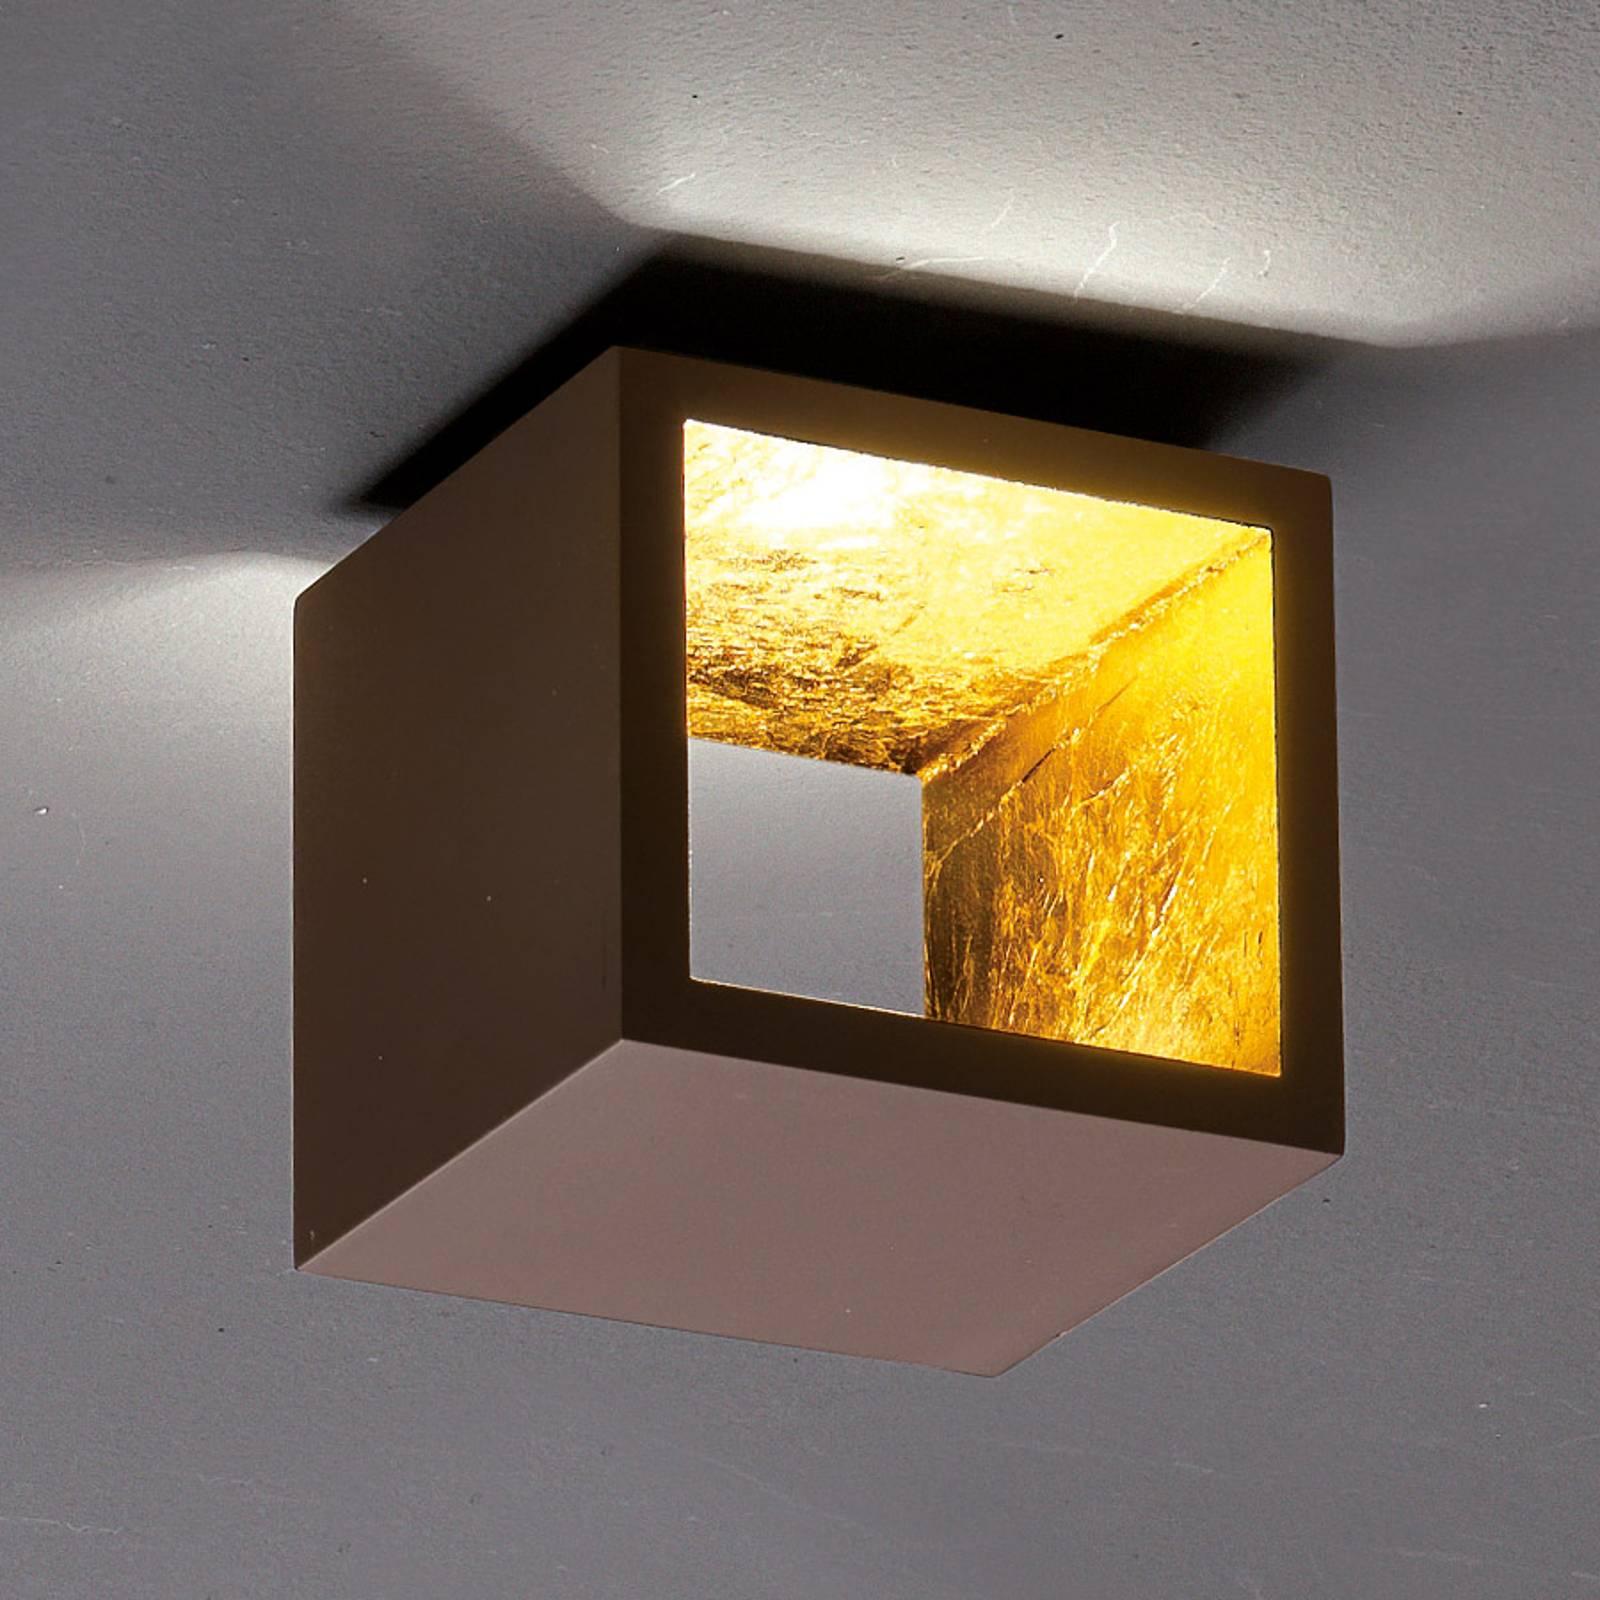 Dobbelsteen LED-plafondlamp Cubò, bruin, goud